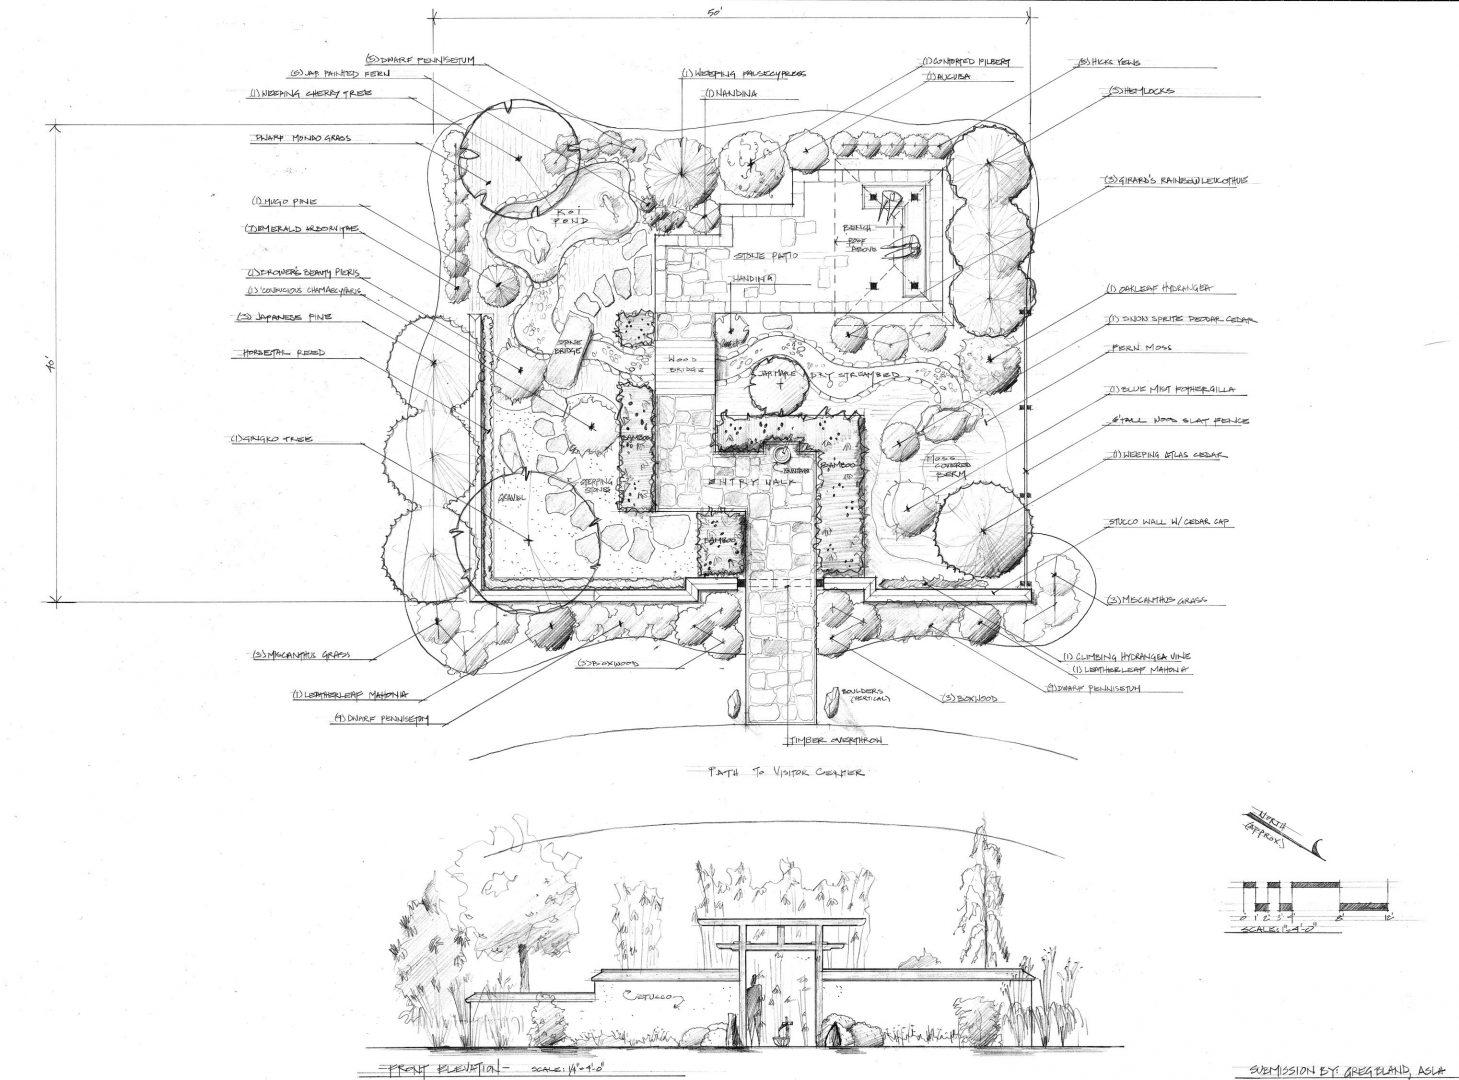 Botanical garden of the ozarks masterplan